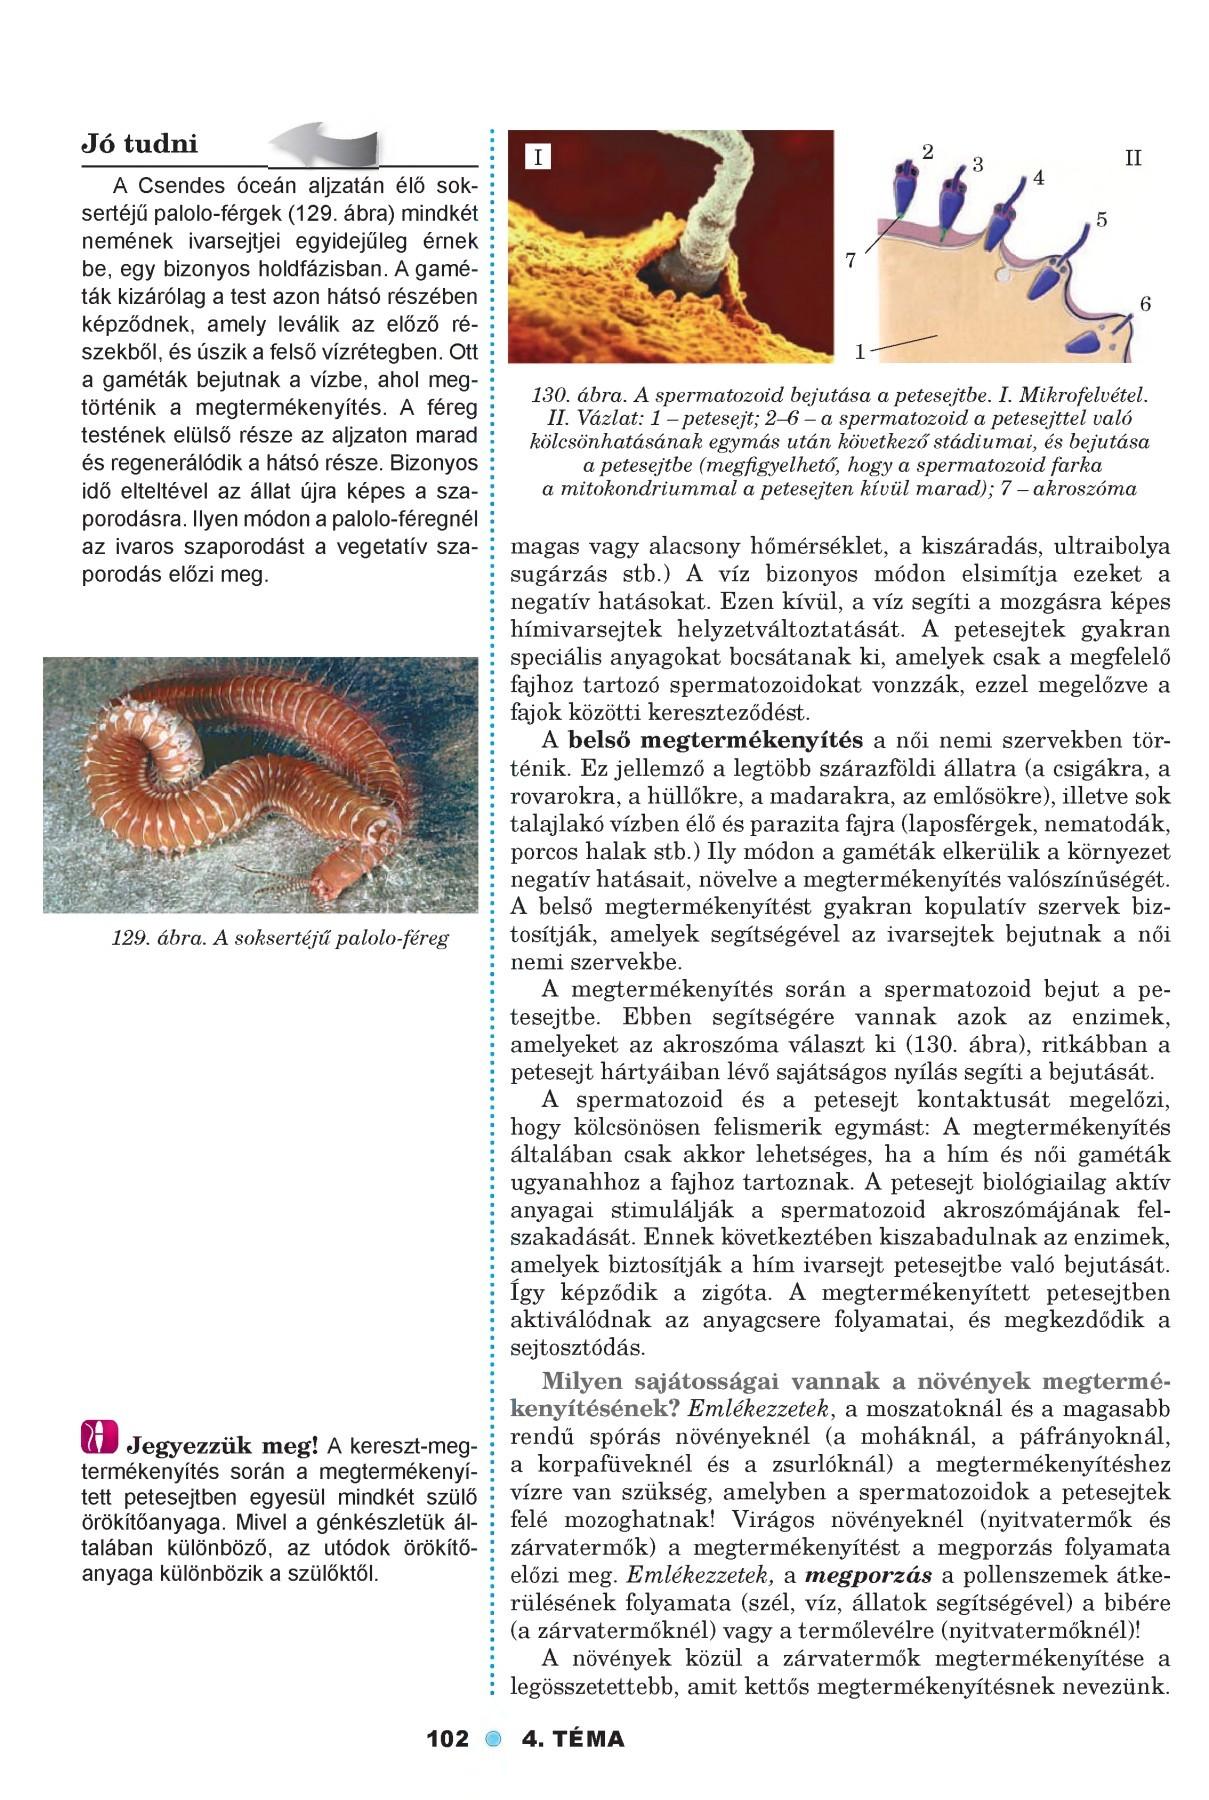 BIO-LOGIA: Parazita férgek